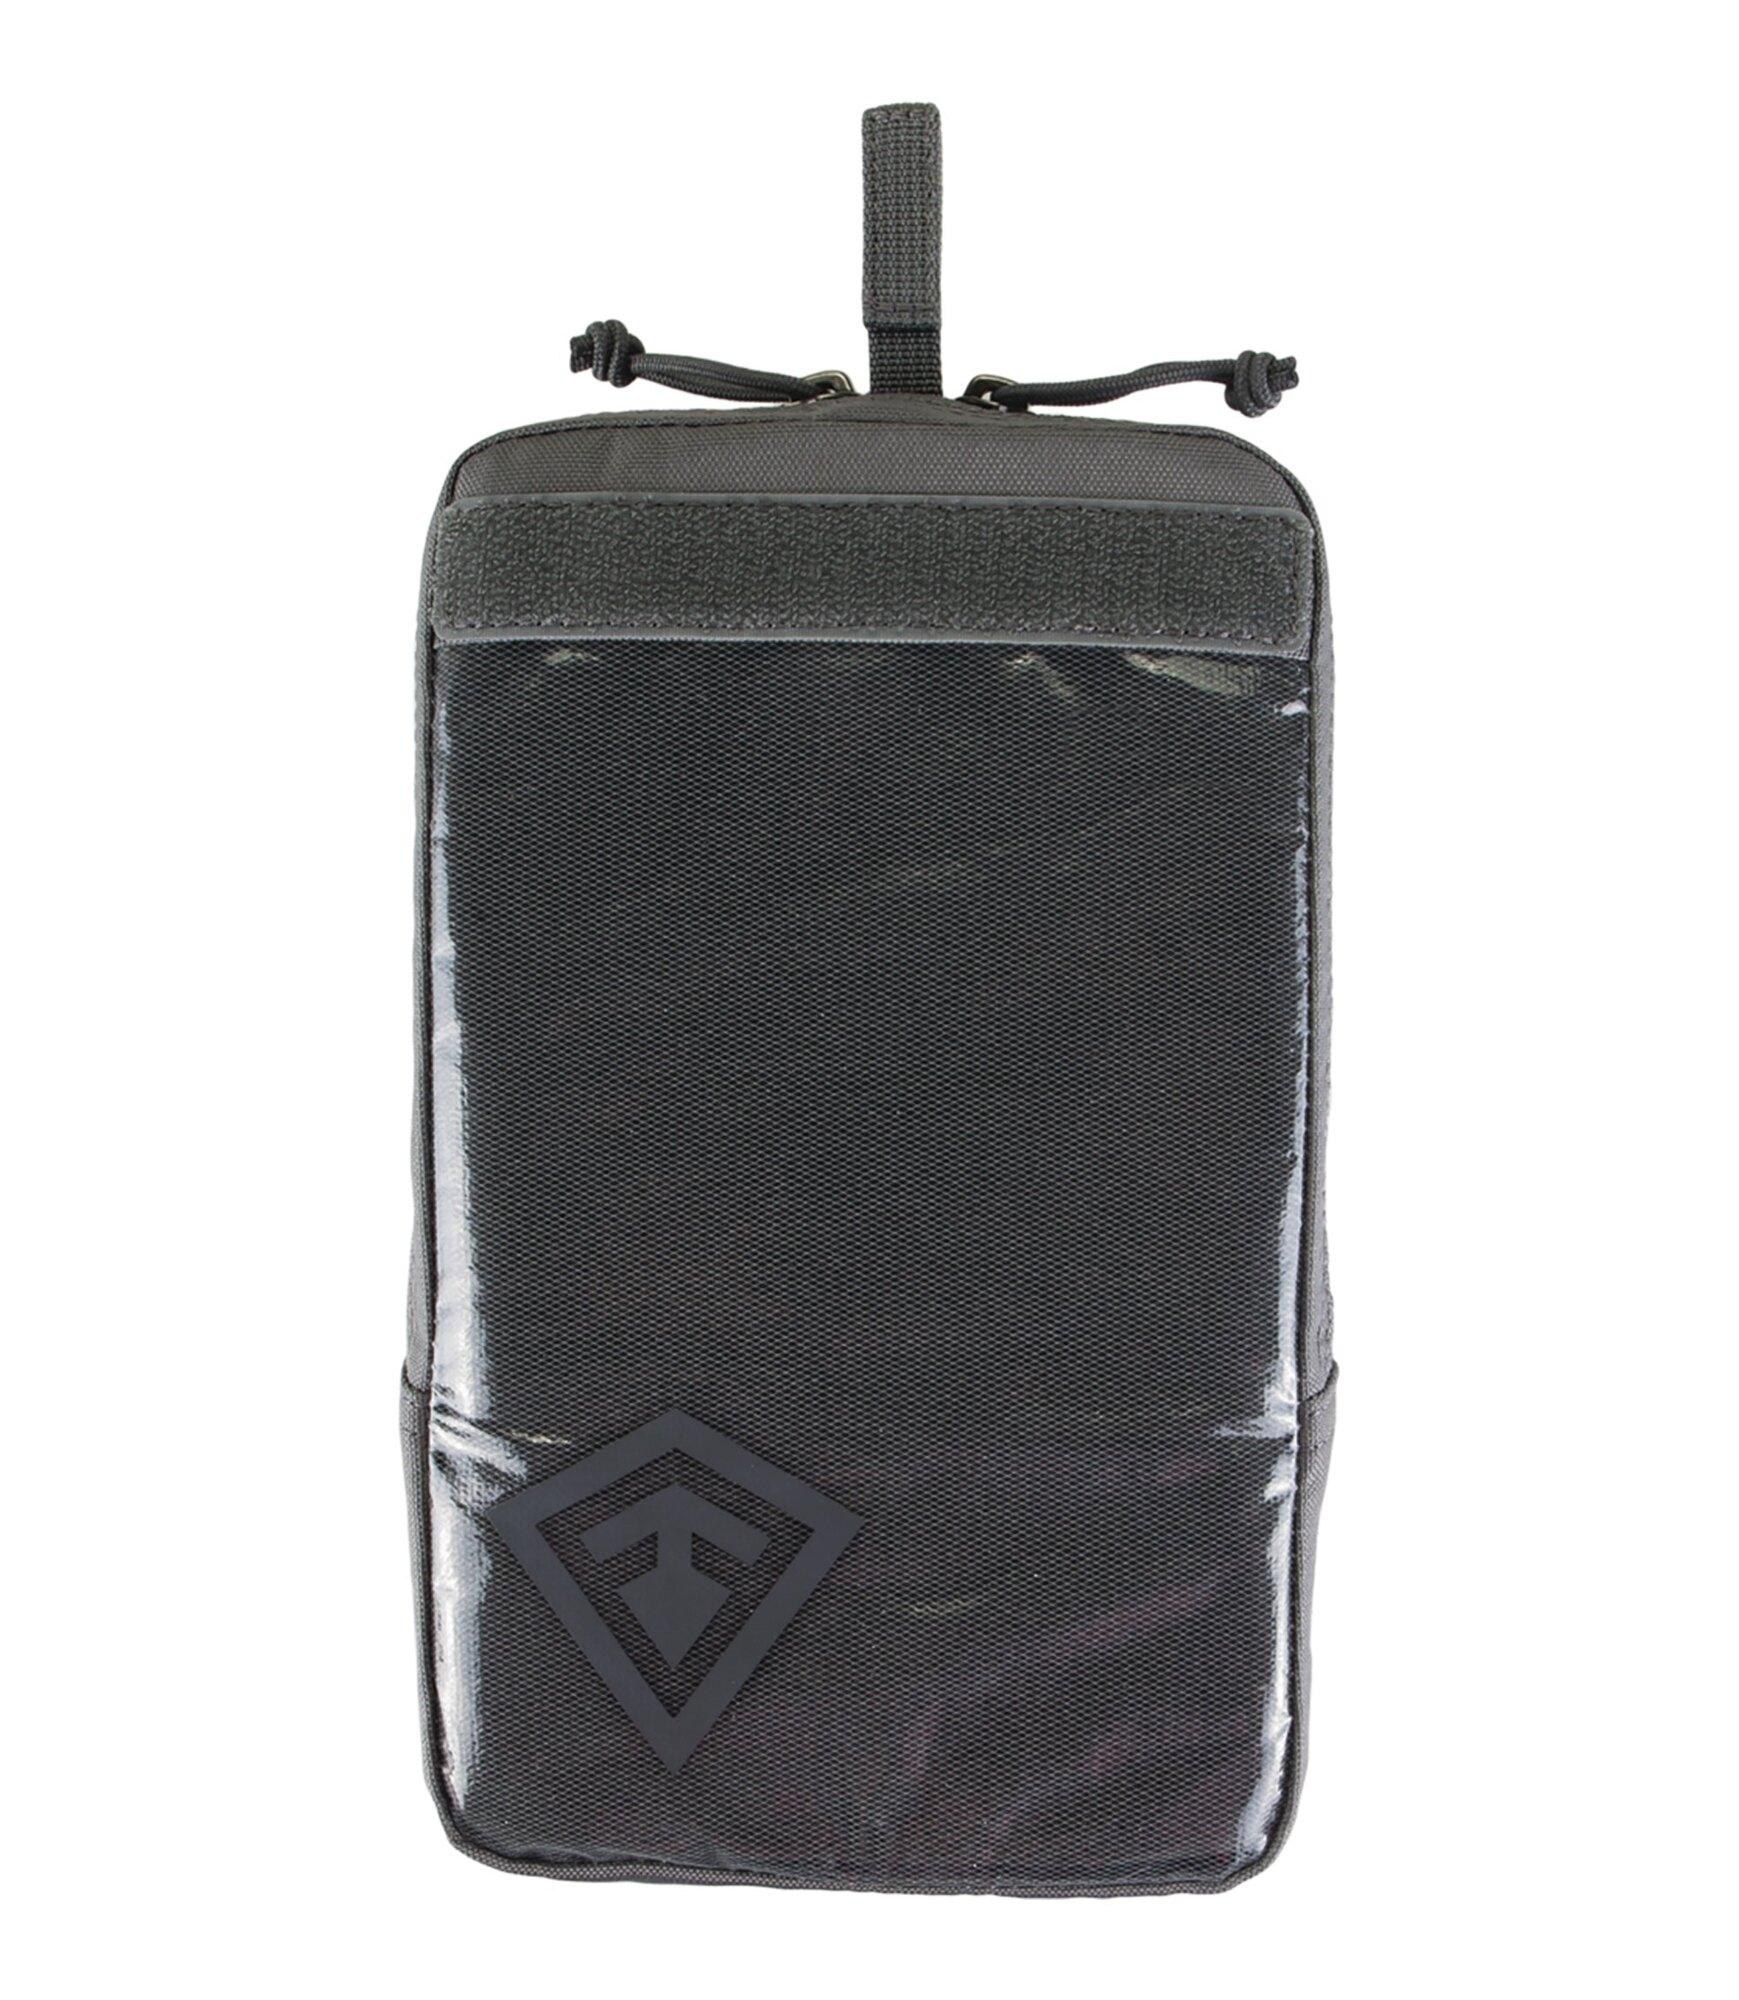 Puzdro Velcro 6x10 First Tactical® - sivé